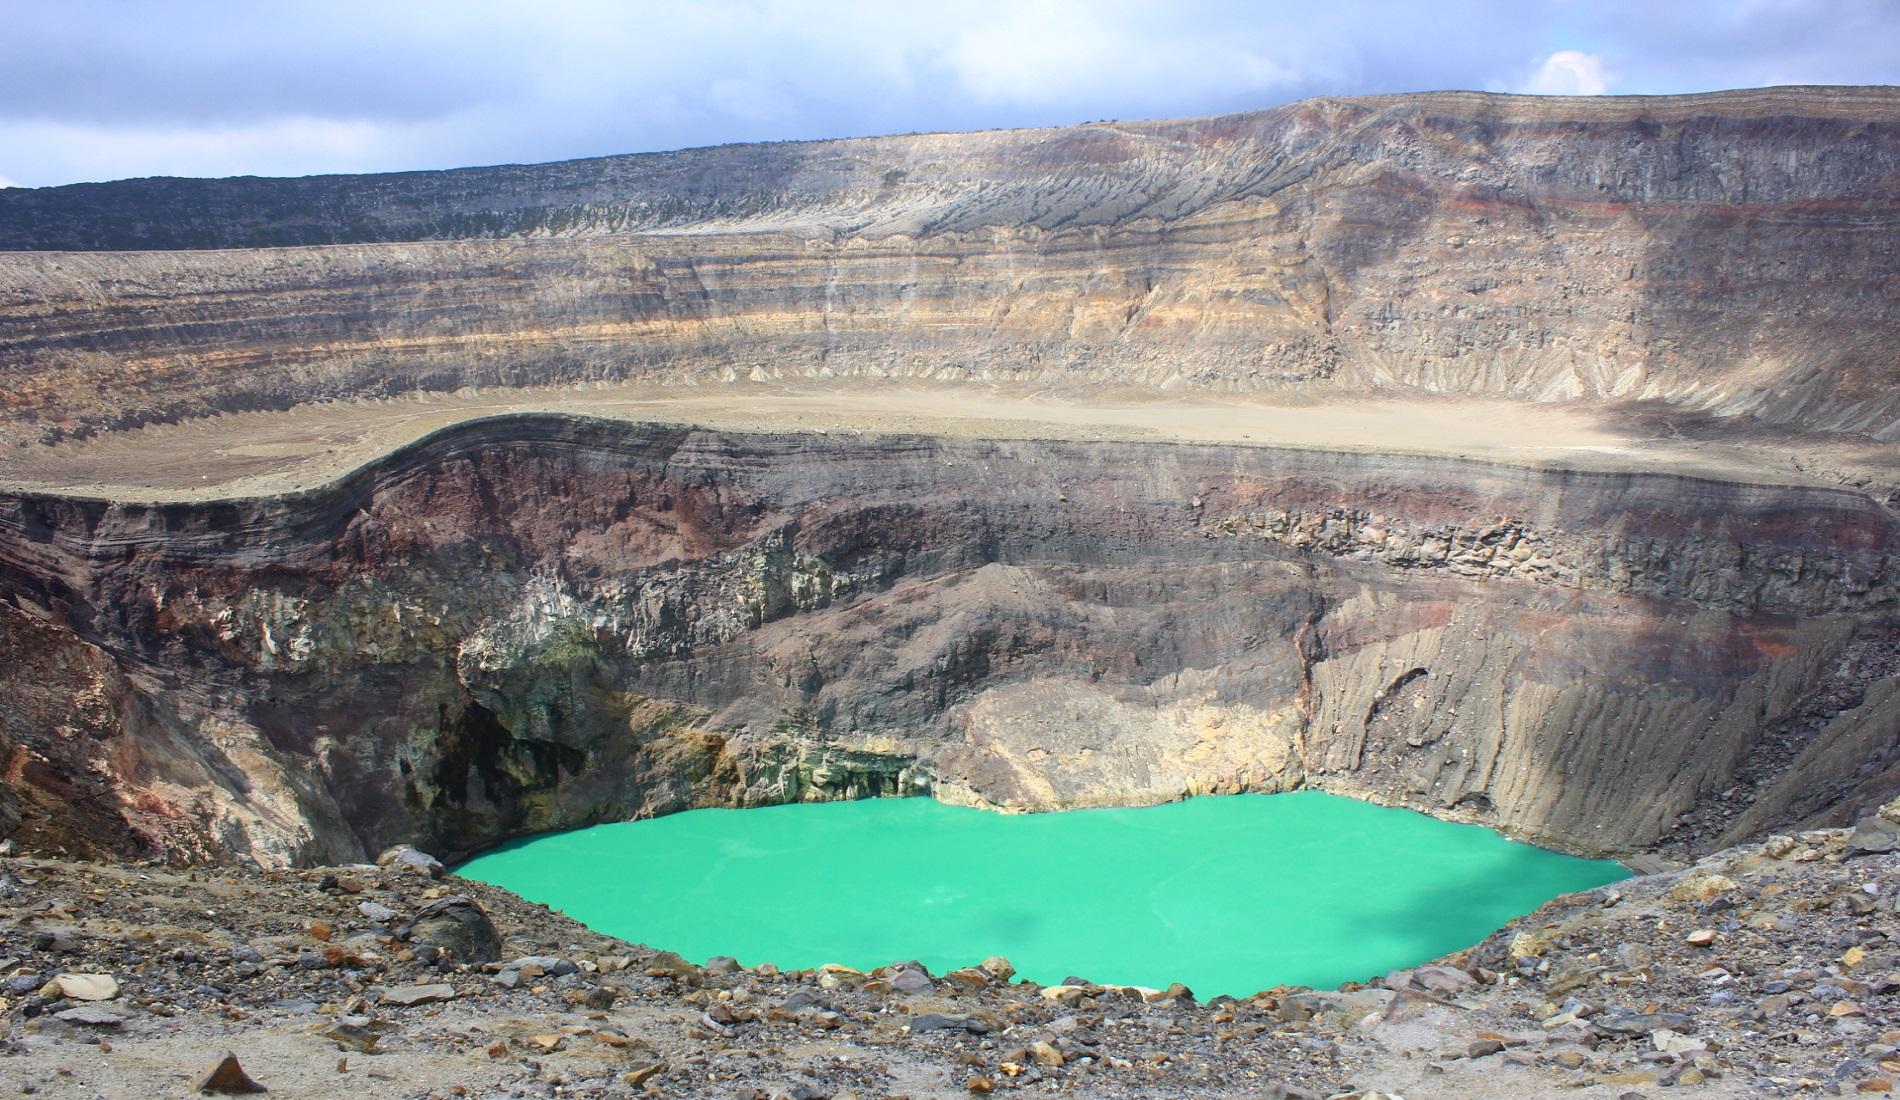 Santa Ana Vulkaan groepsreis midden-amerika